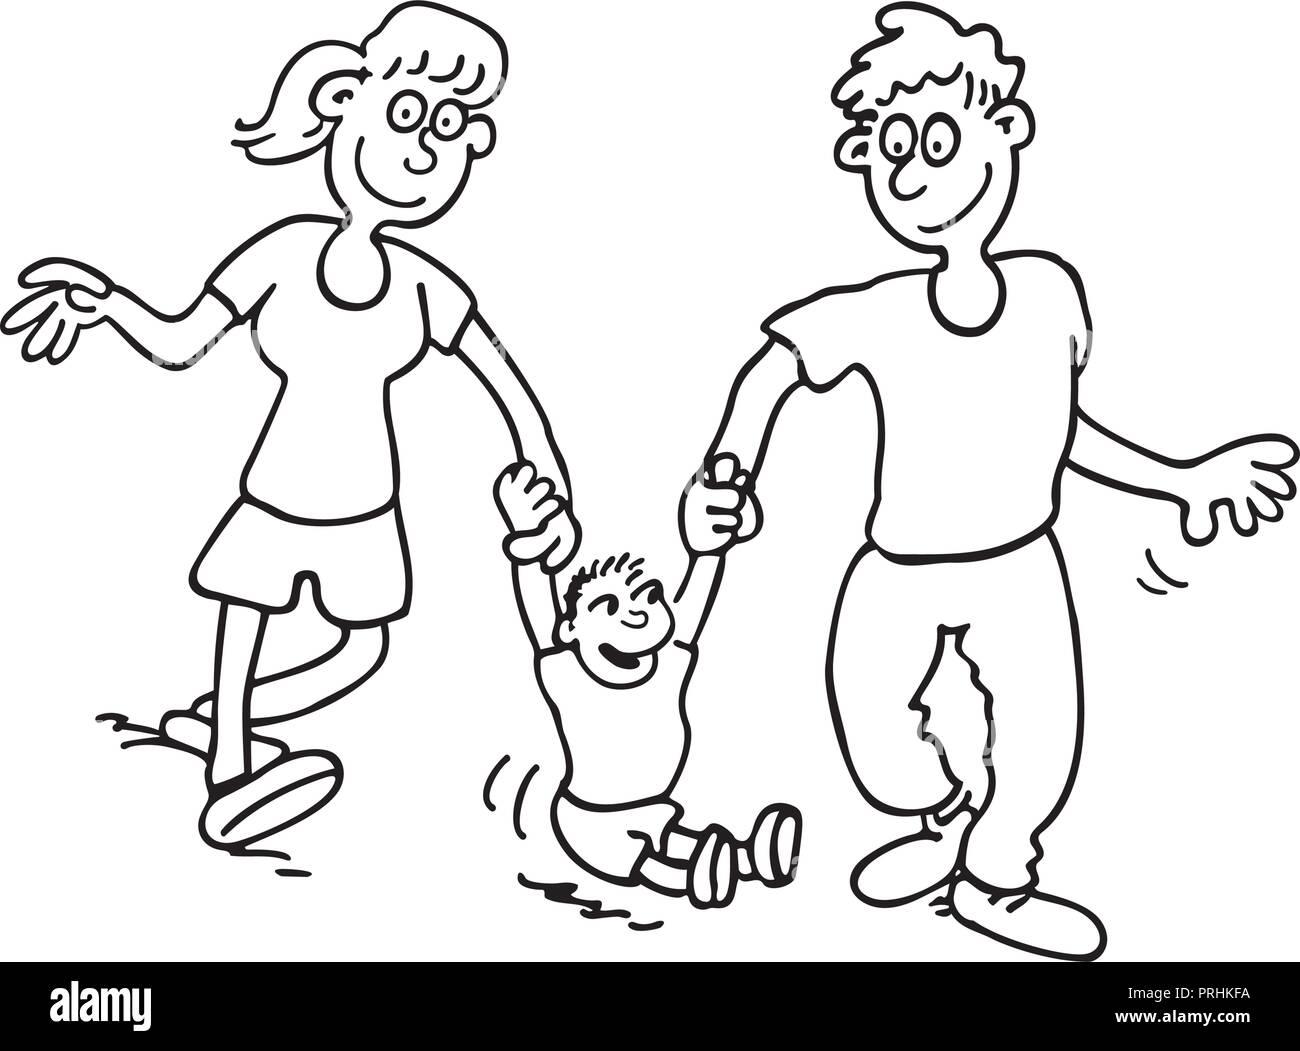 Happy Family Cartoon Outlined Cartoon Handrawn Sketch Illustration Vector Stock Vector Image Art Alamy